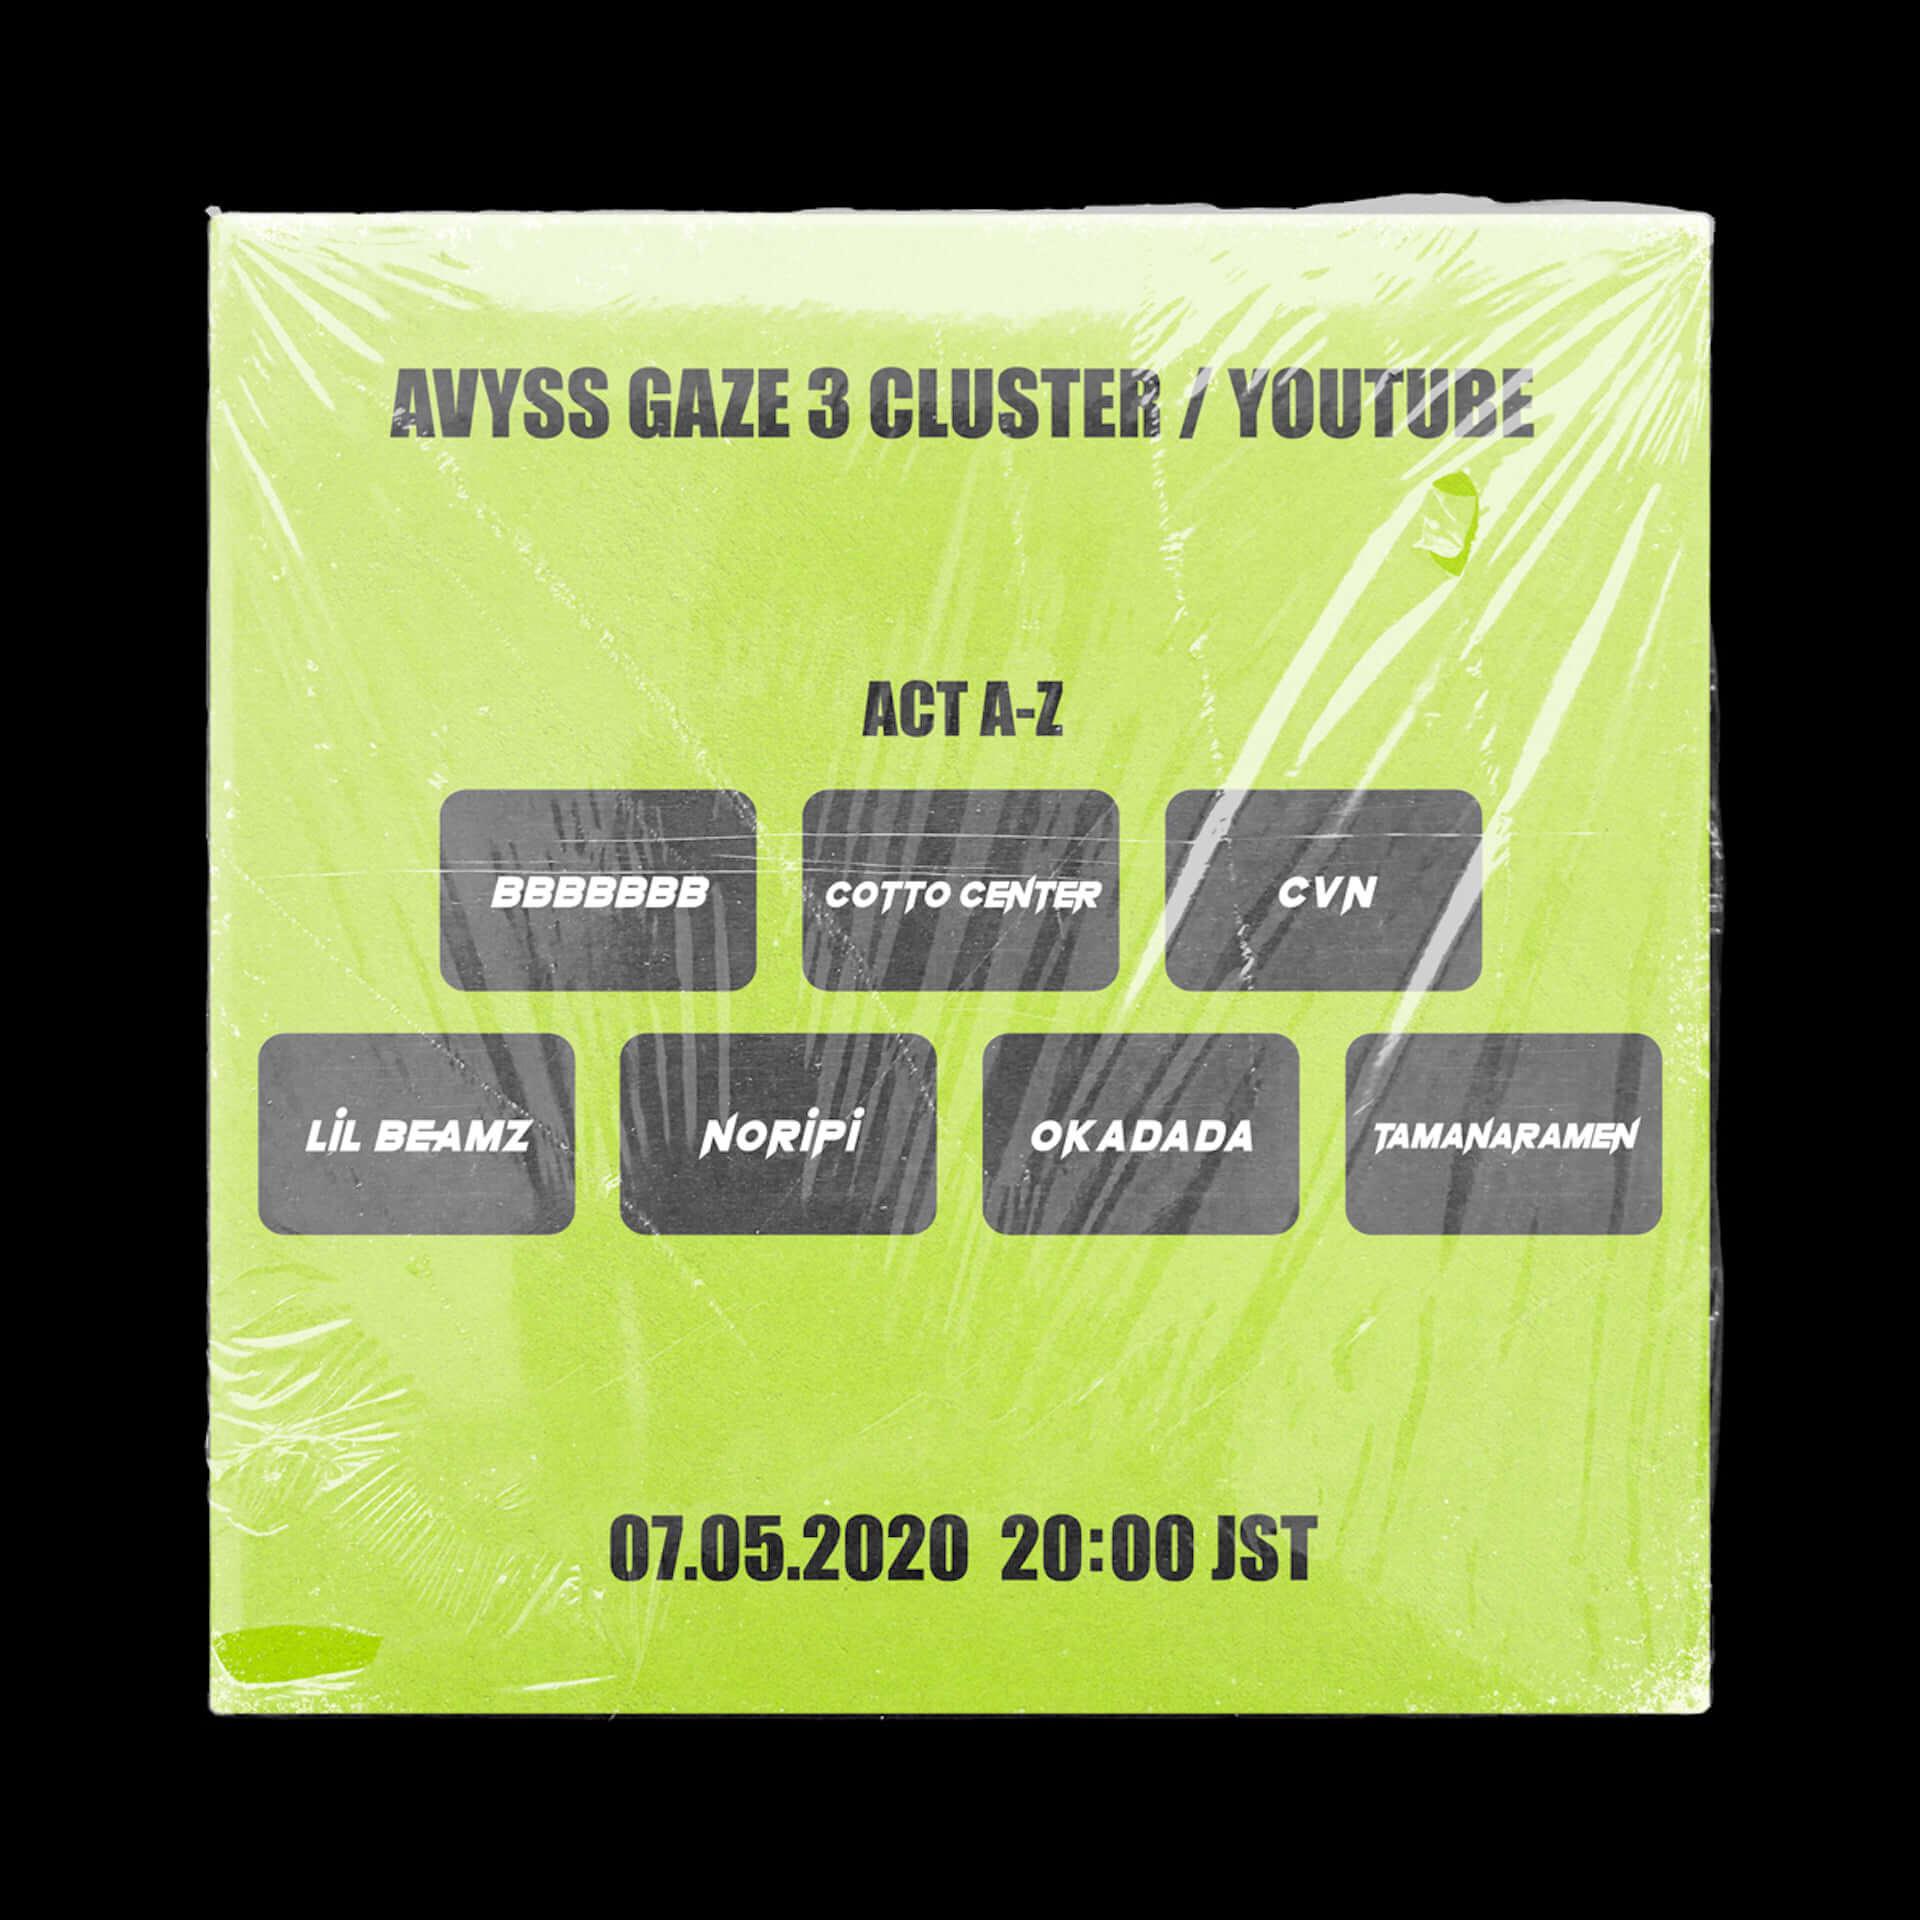 okadada、noripi、BBBBBBBら7組が仮想ナイトクラブに登場!<AVYSS GAZE>第3弾詳細が解禁&仮想空間体験プログラムも公開 music200623_avyssgaze_2-1-1920x1920